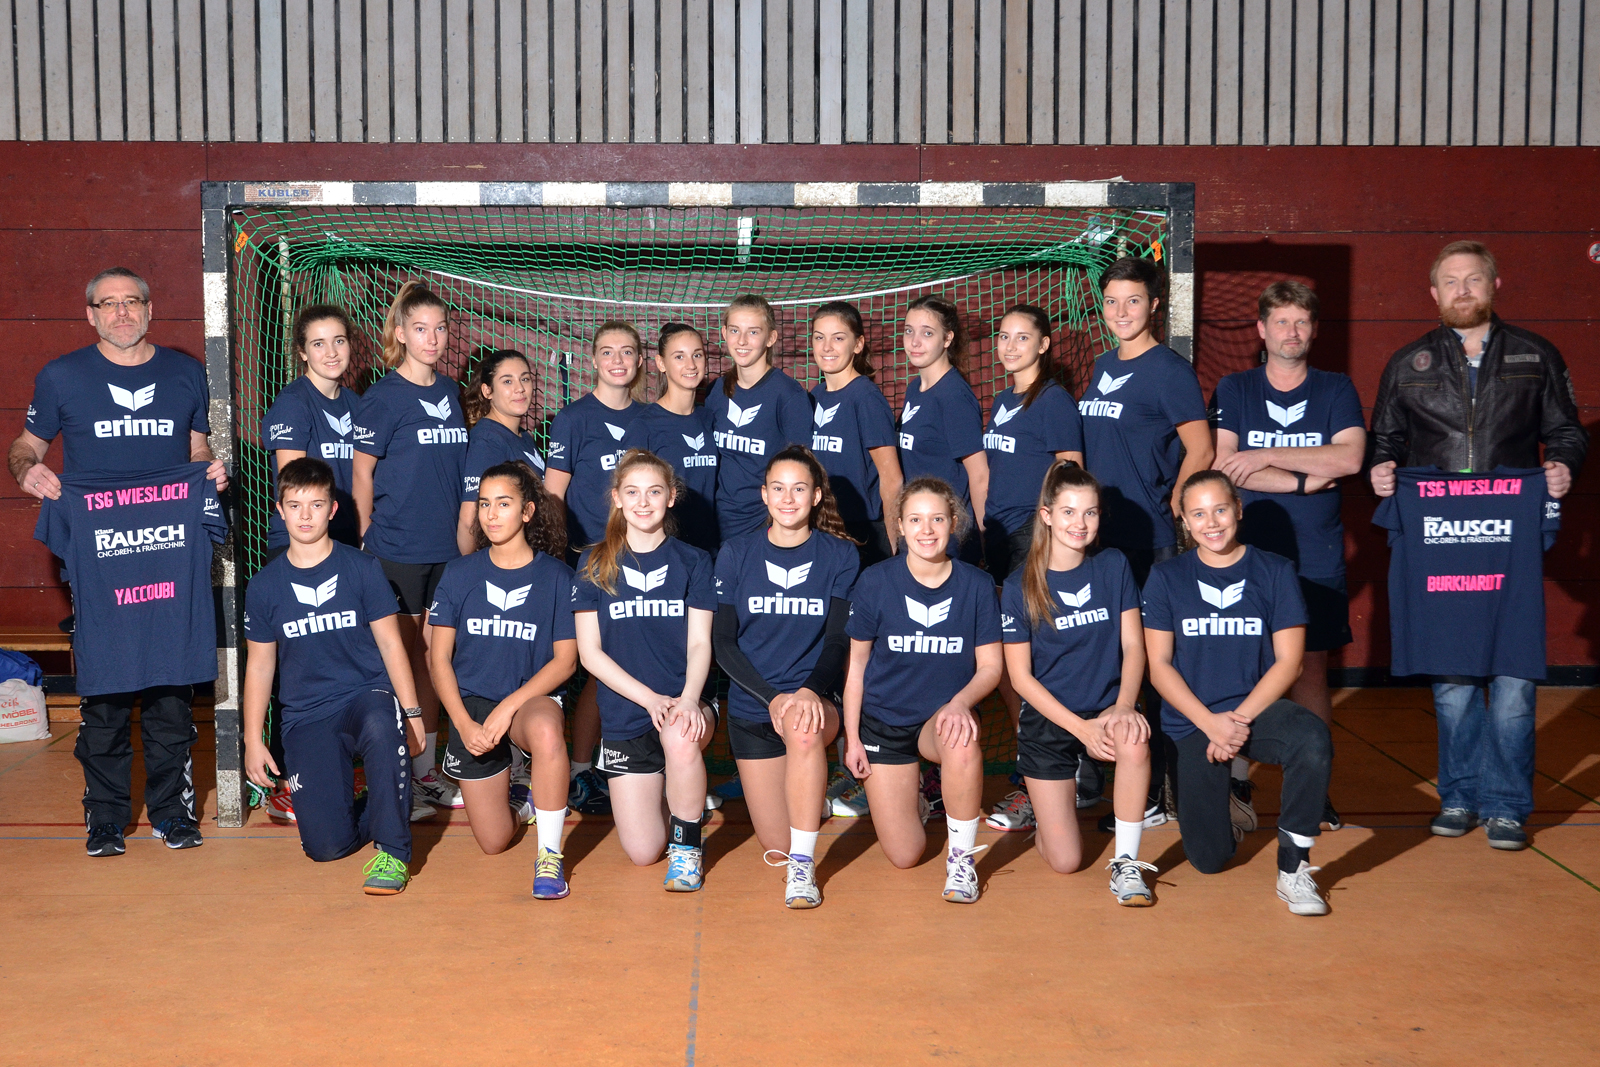 sponsoring-rausch-aufwaermshirts-b-front_dsc_6247